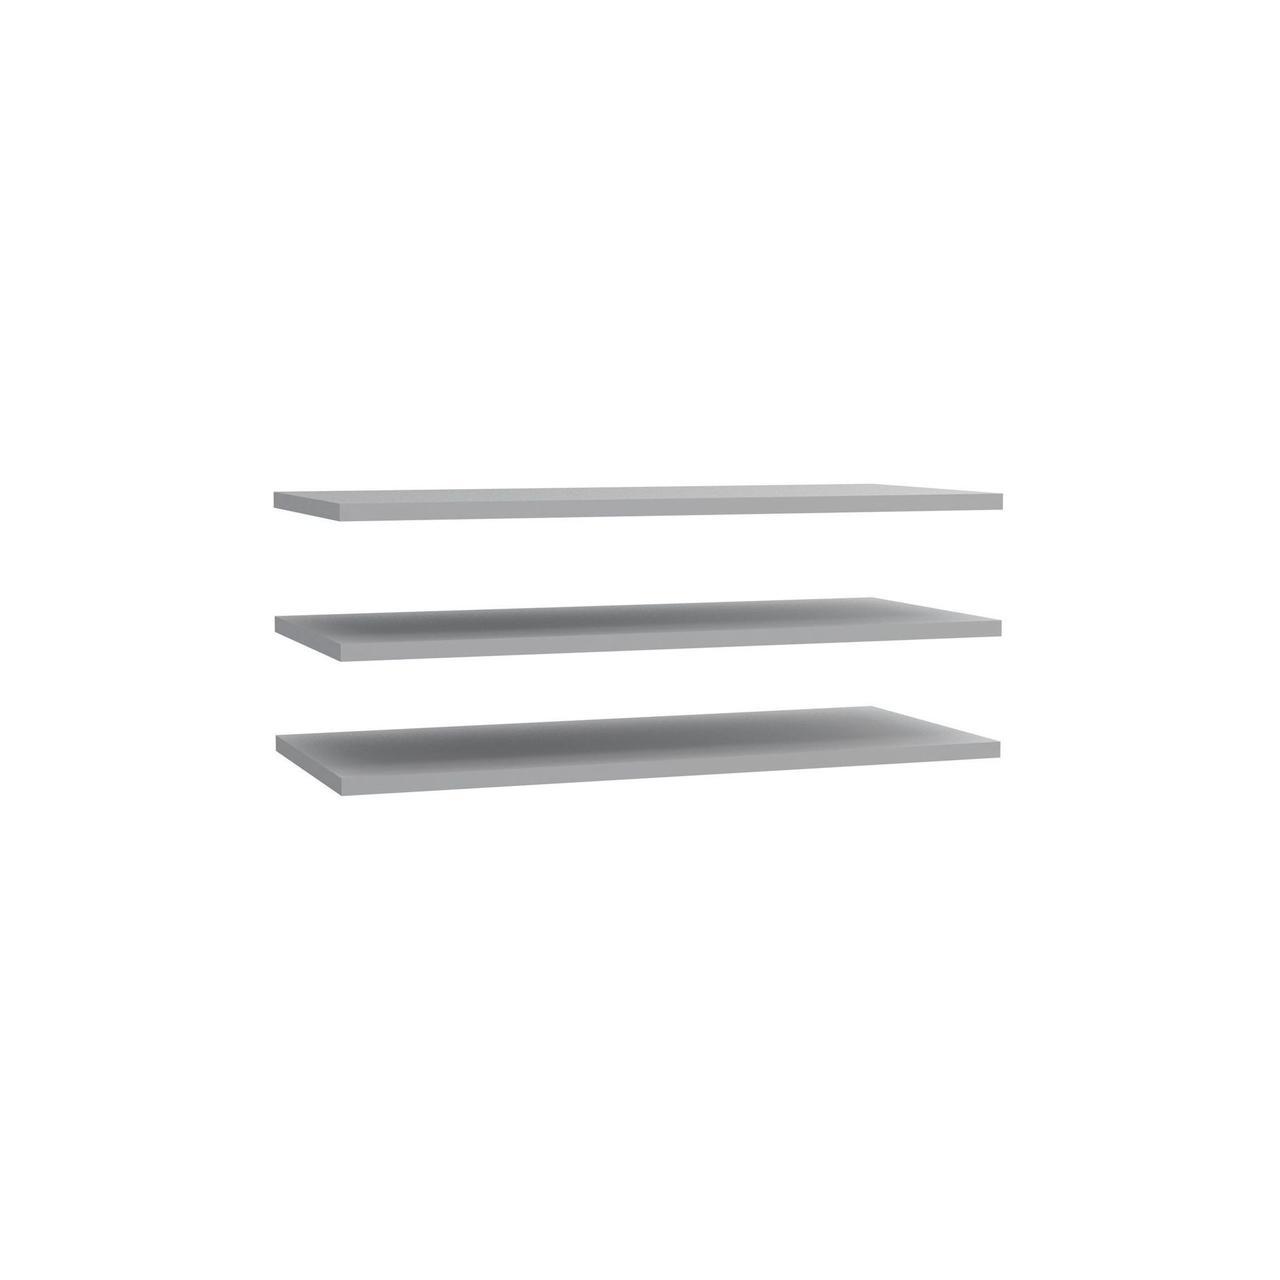 Полка 3 шт. STDD32-A06 DREAMER Forte серый